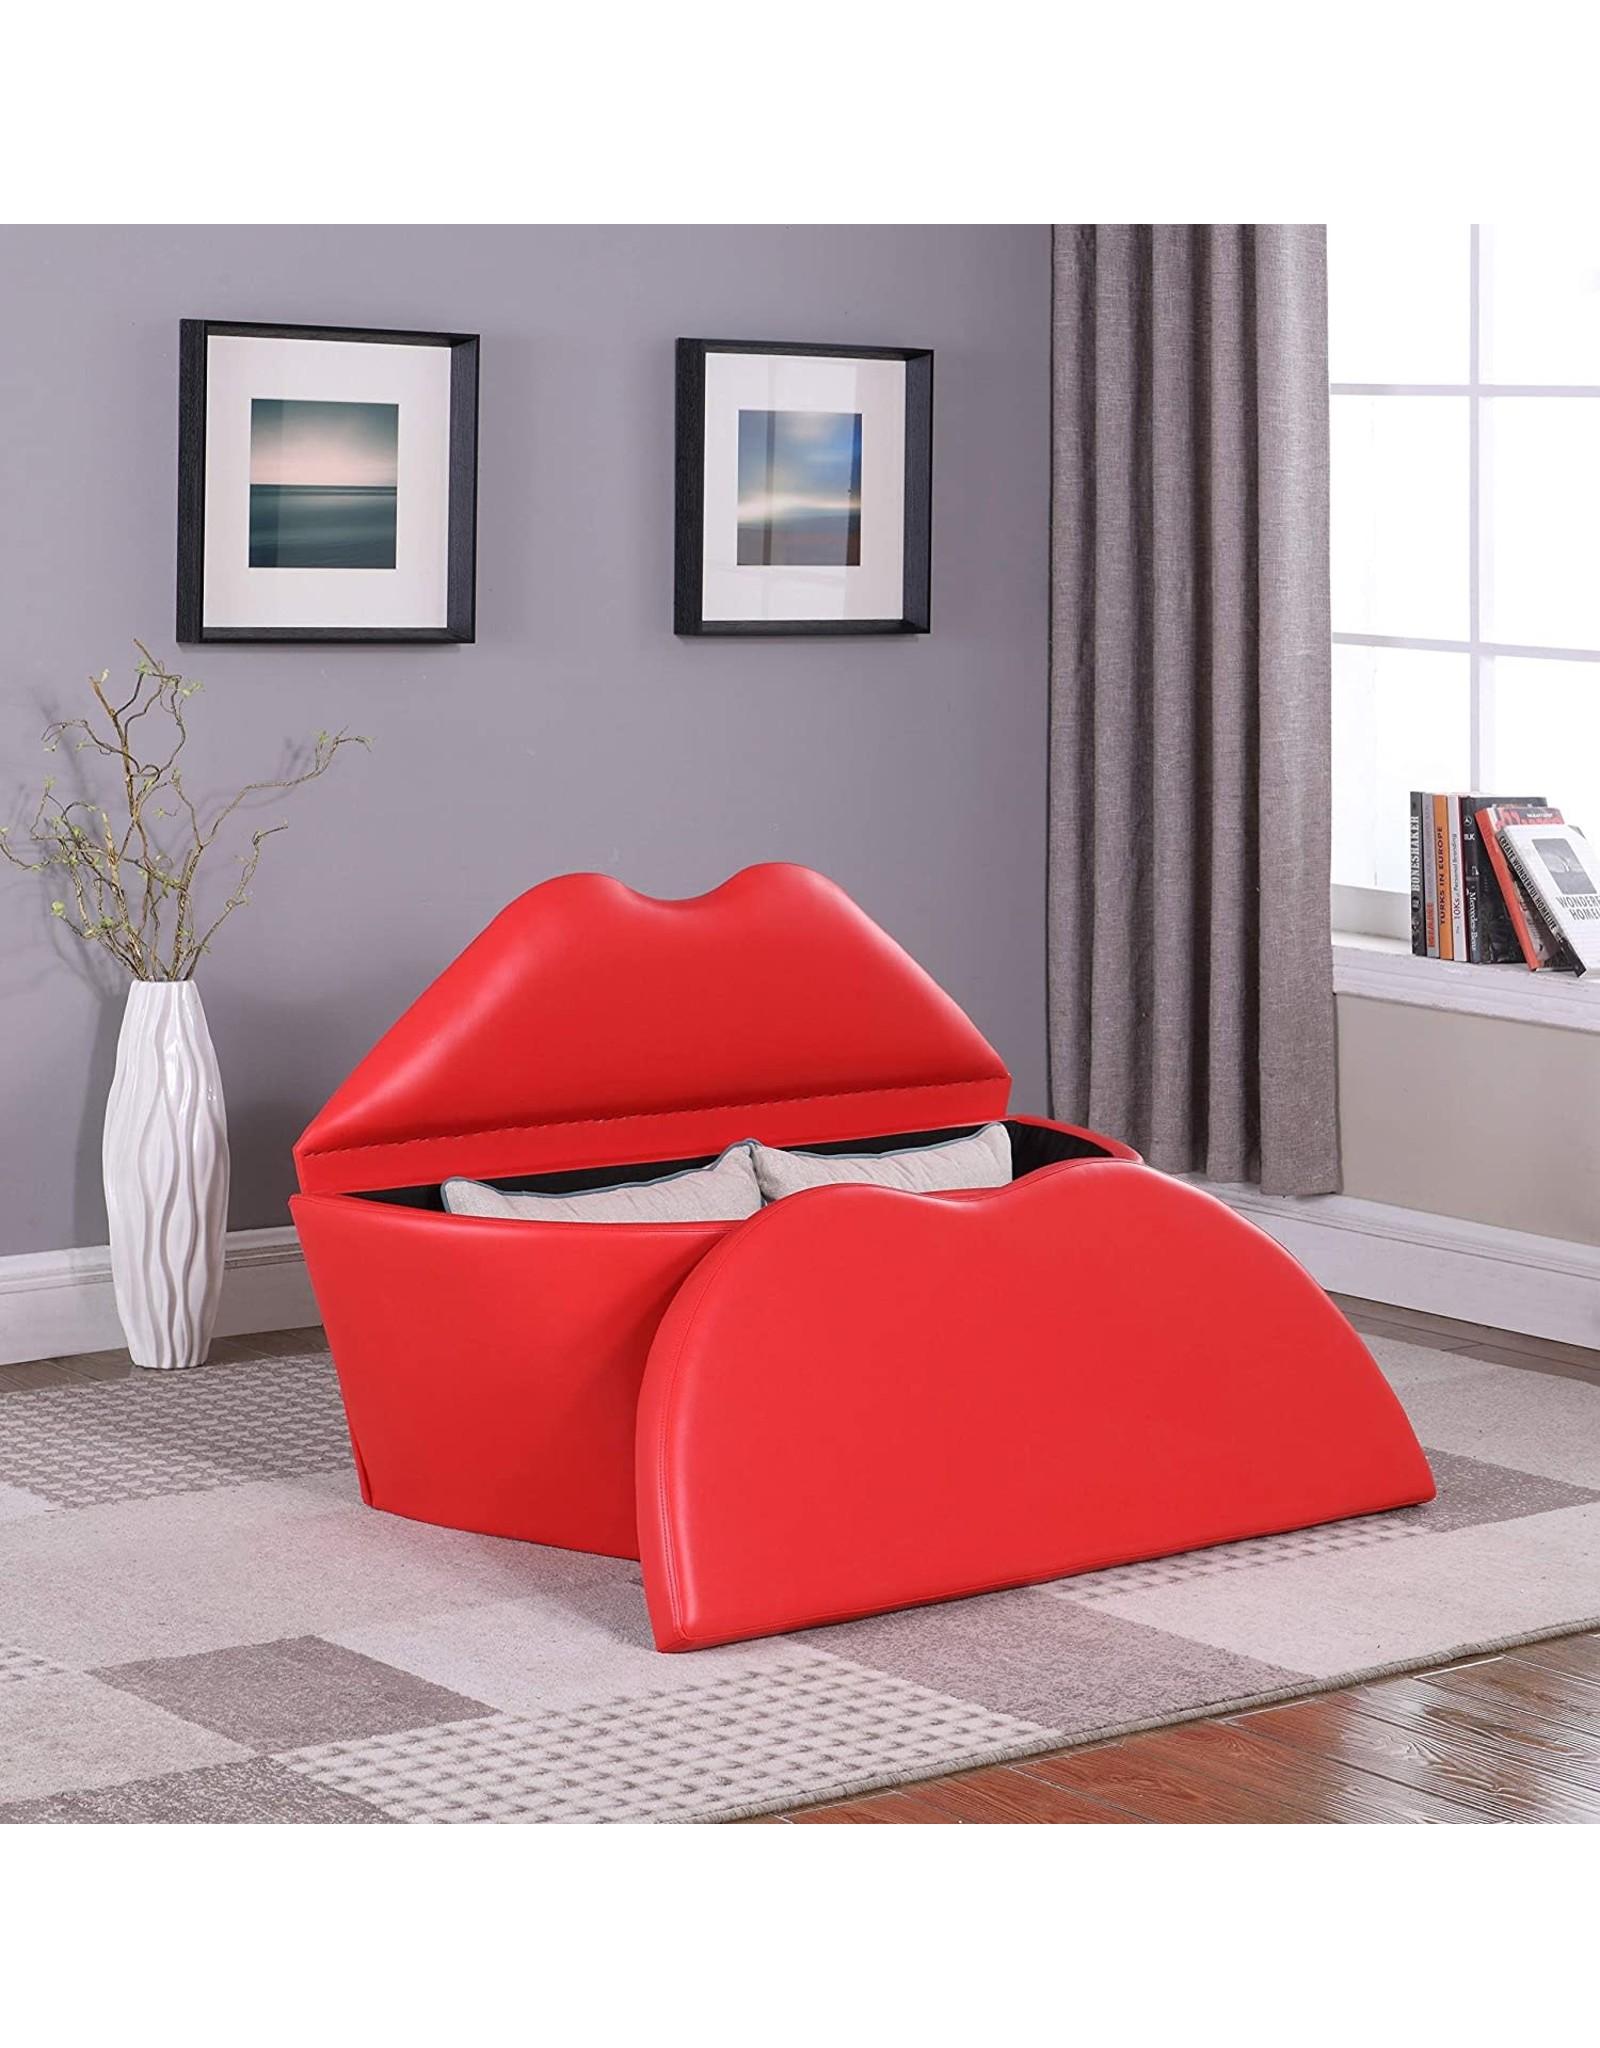 "ORE ORE international 31"" In Red Lips Storage Leisure Loveseat Chair"